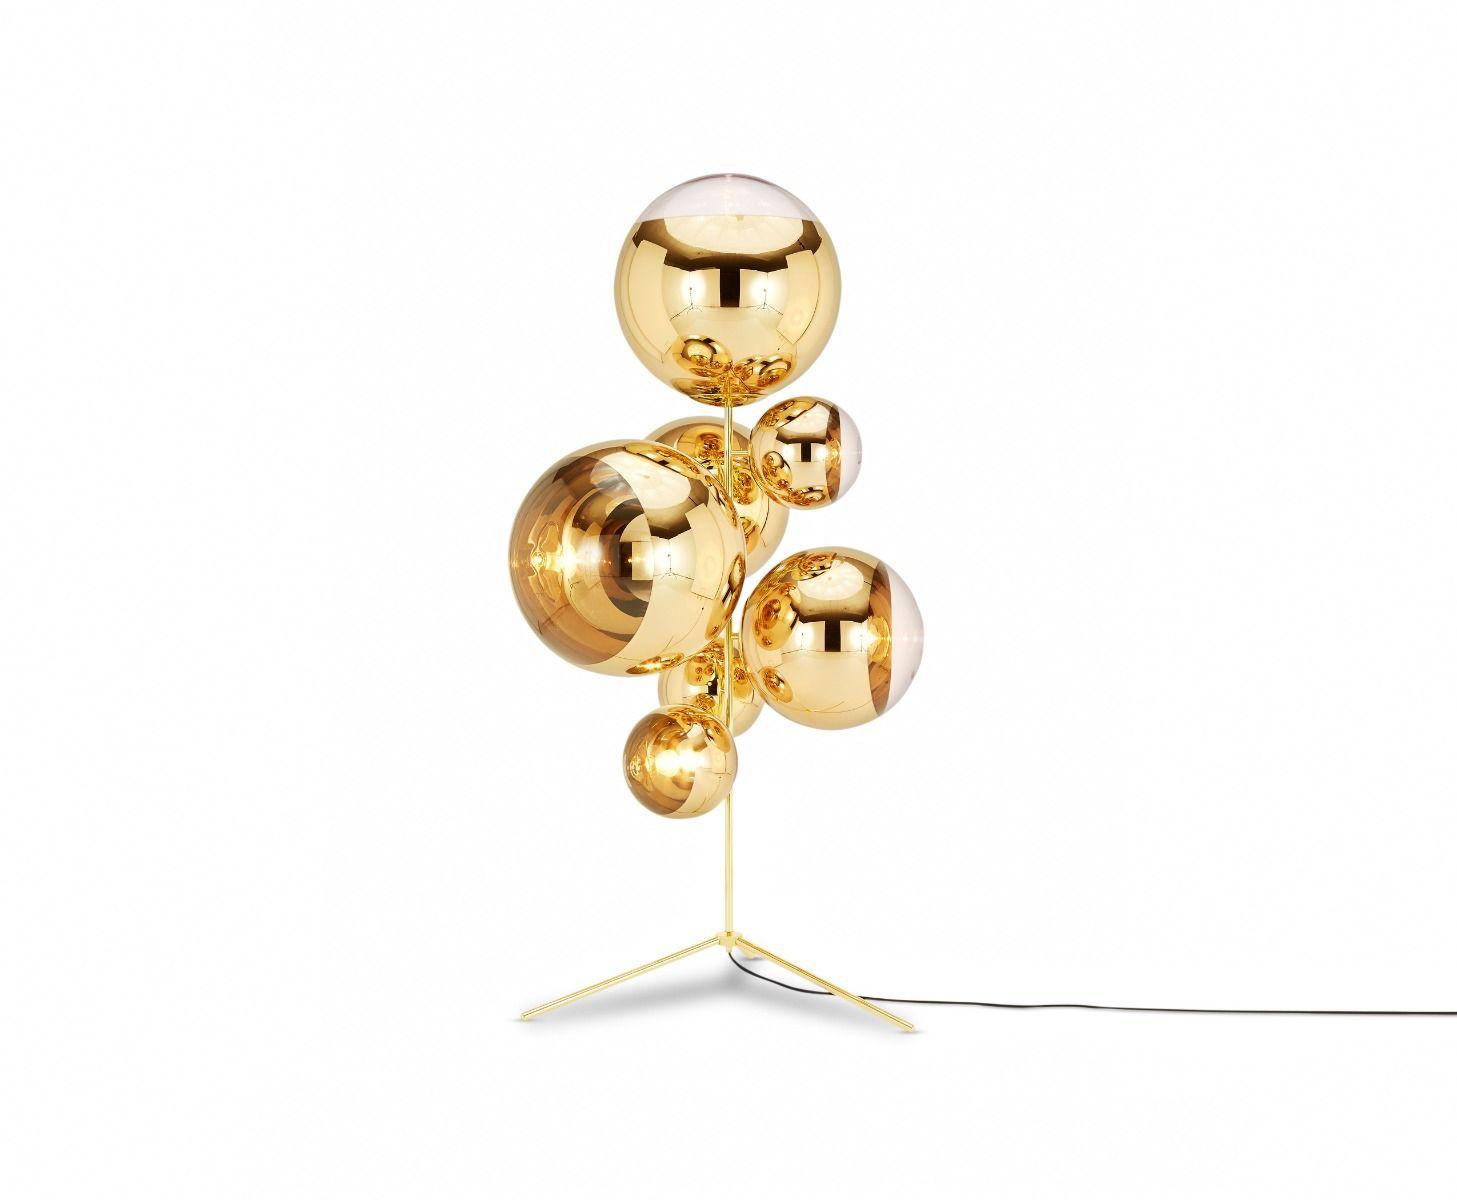 mirror_ball_gold_standing_chandelier_main, tom dixon.jpg